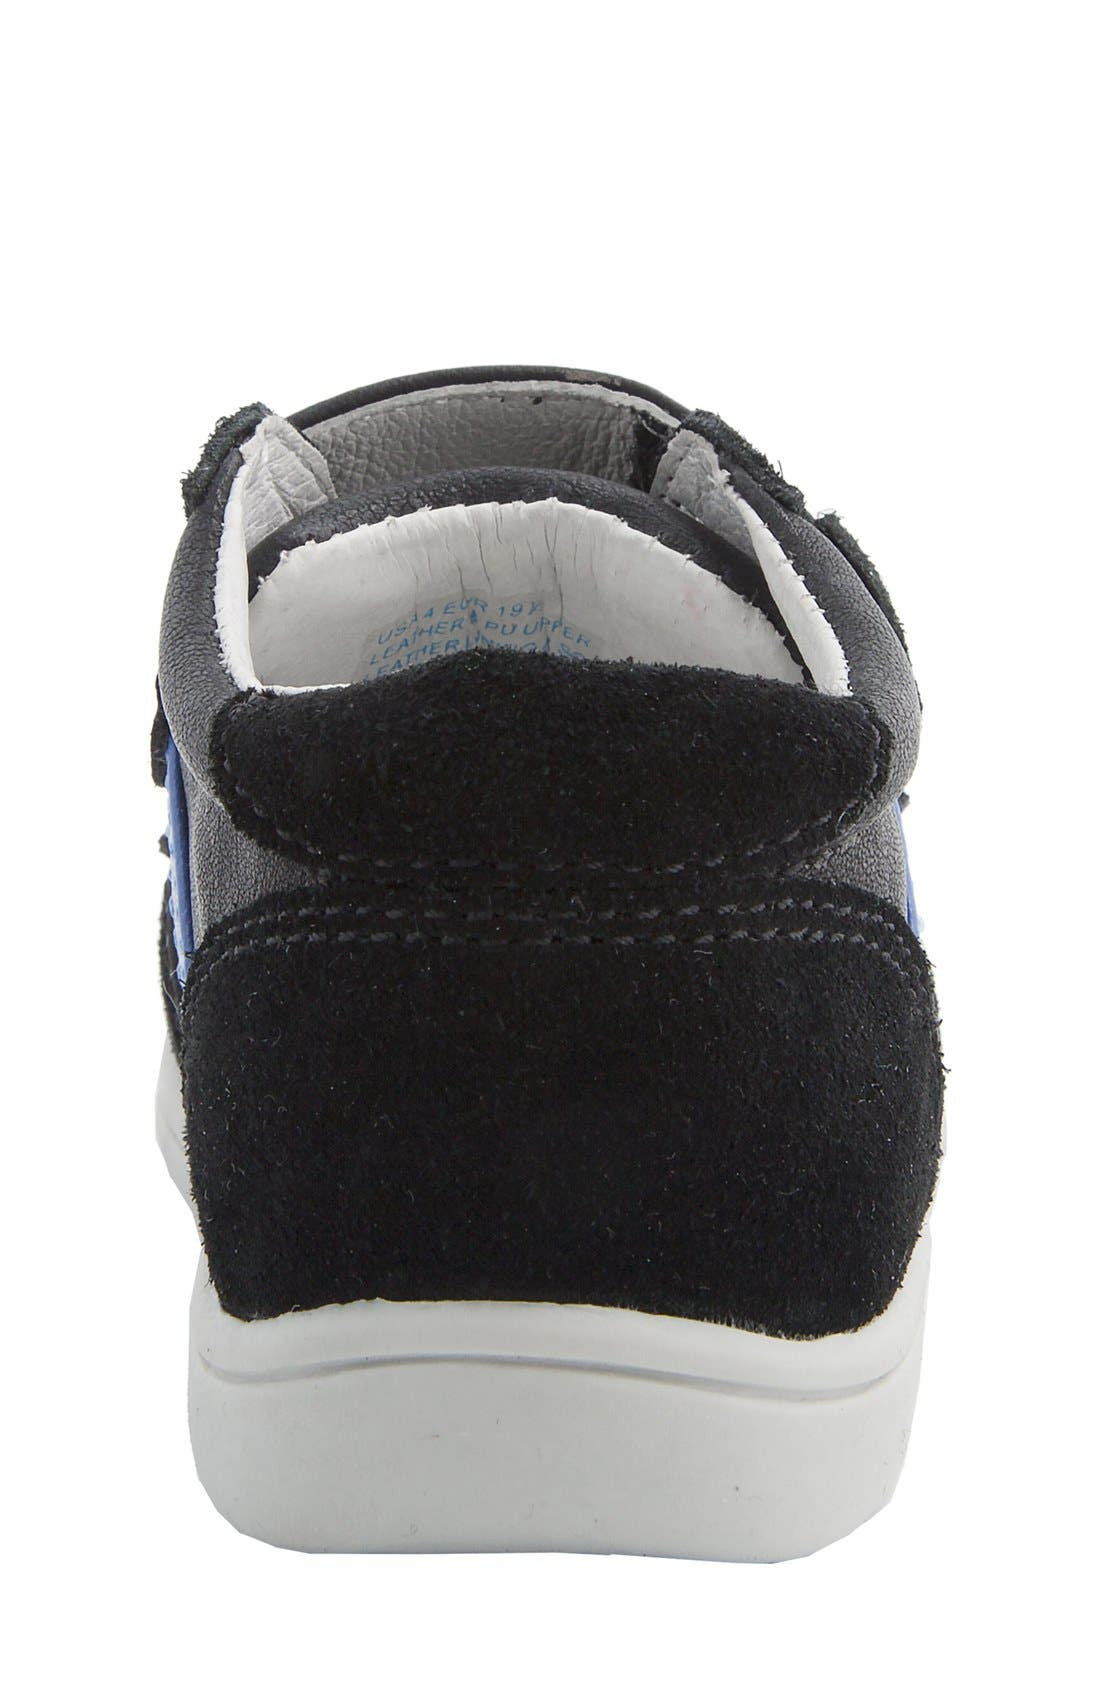 Nina 'Everest' Sneaker,                             Alternate thumbnail 5, color,                             Black Burnished